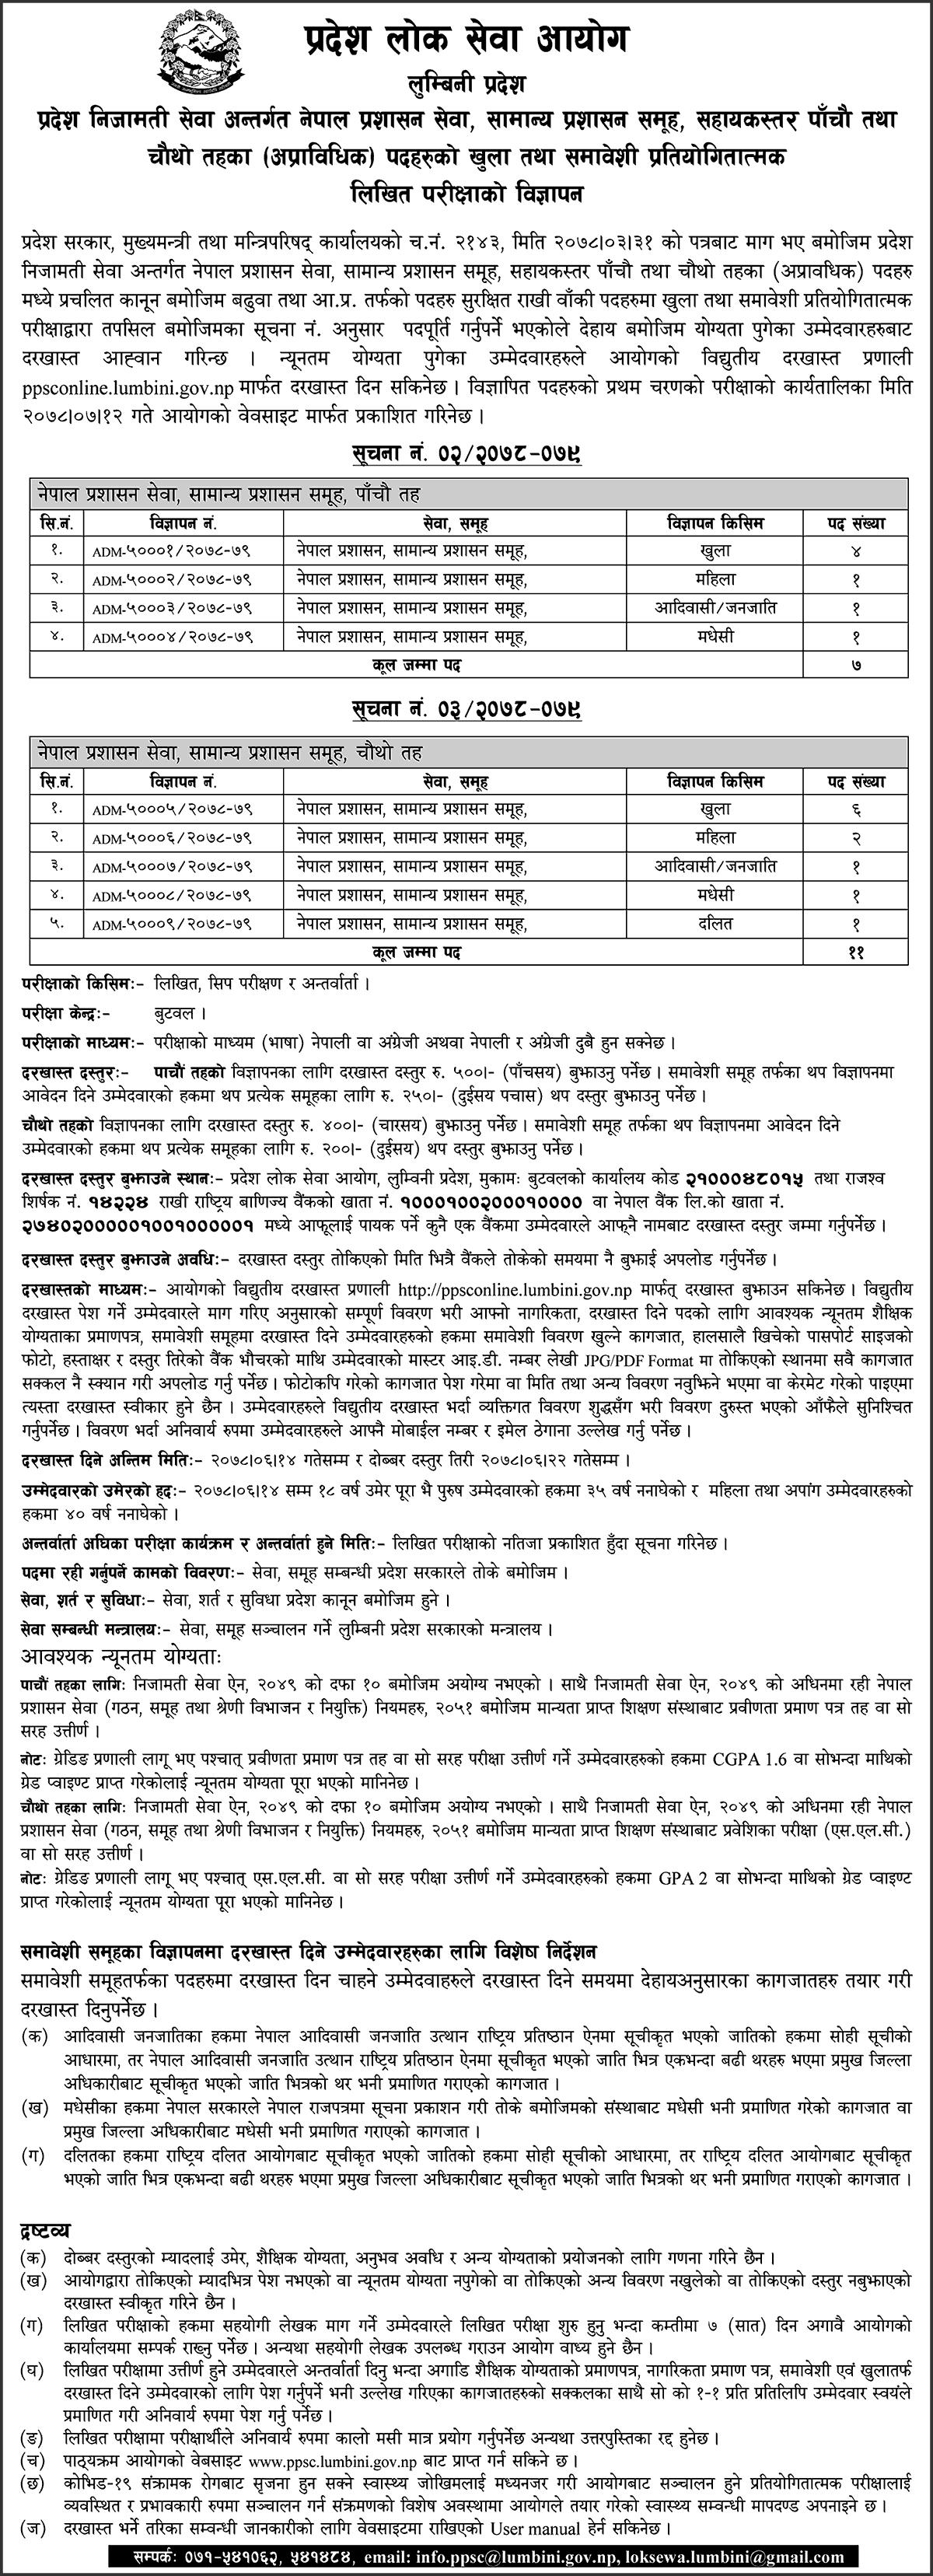 Lumbini Pradesh Lok Sewa Aayog Vacancy for 4th and 5th Level Administration Service